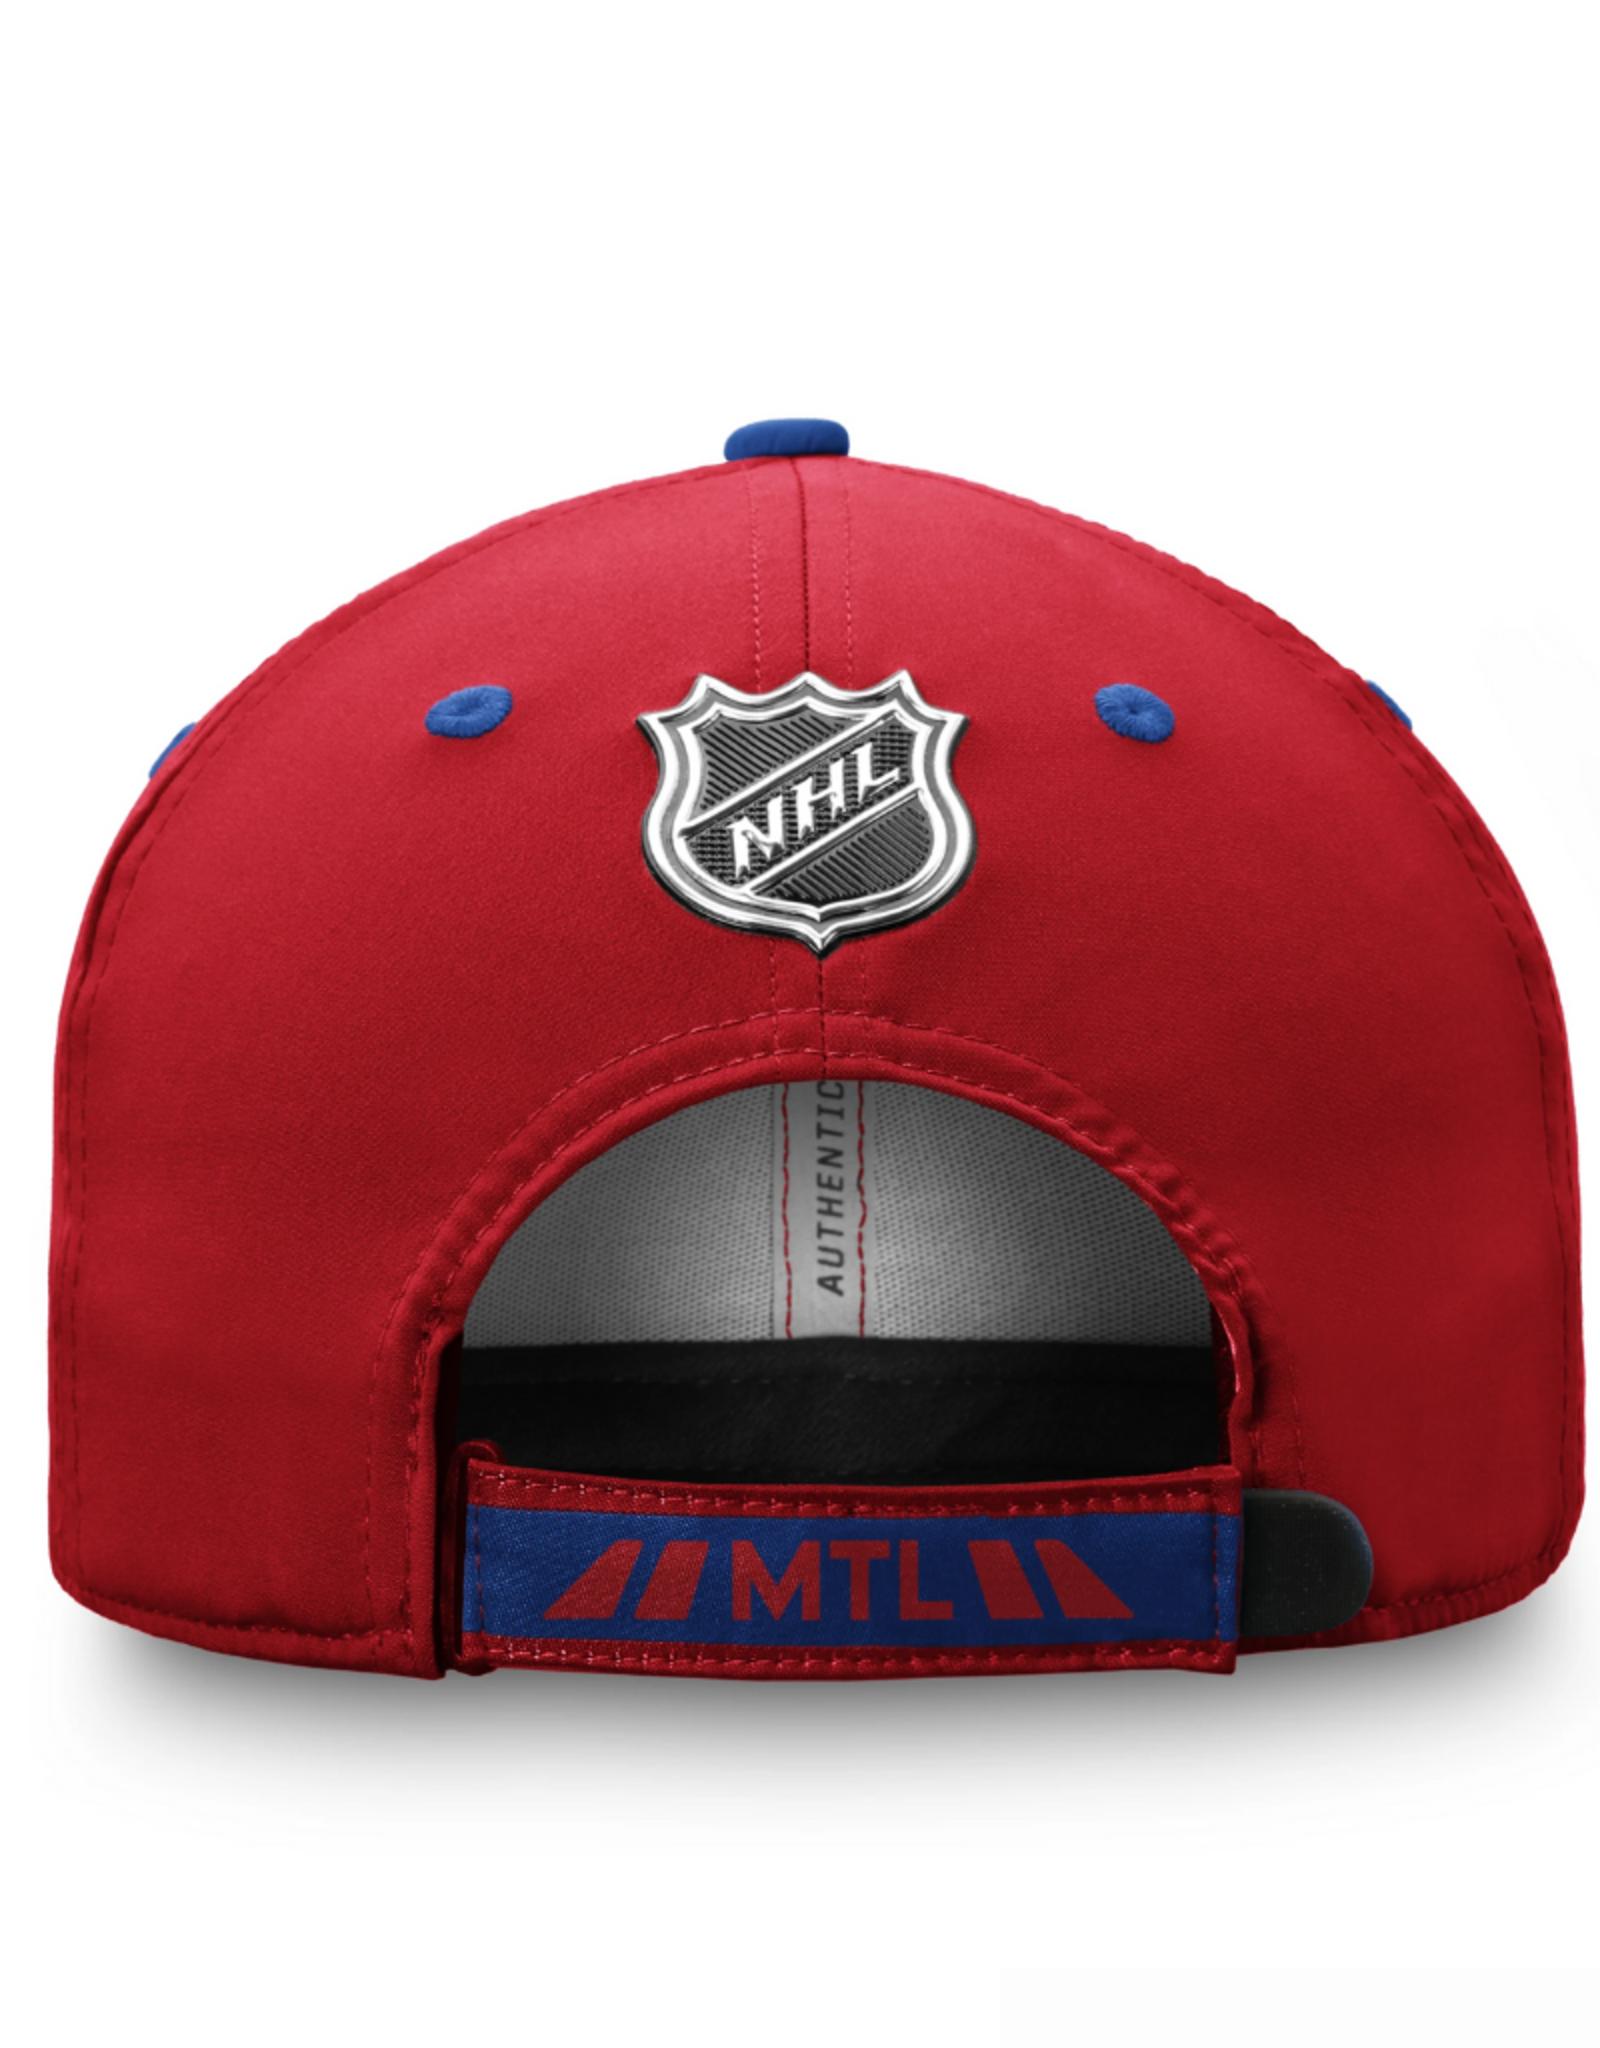 Fanatics Fanatics Men's '20 Locker Room Adjustable Hat Montreal Canadiens Red